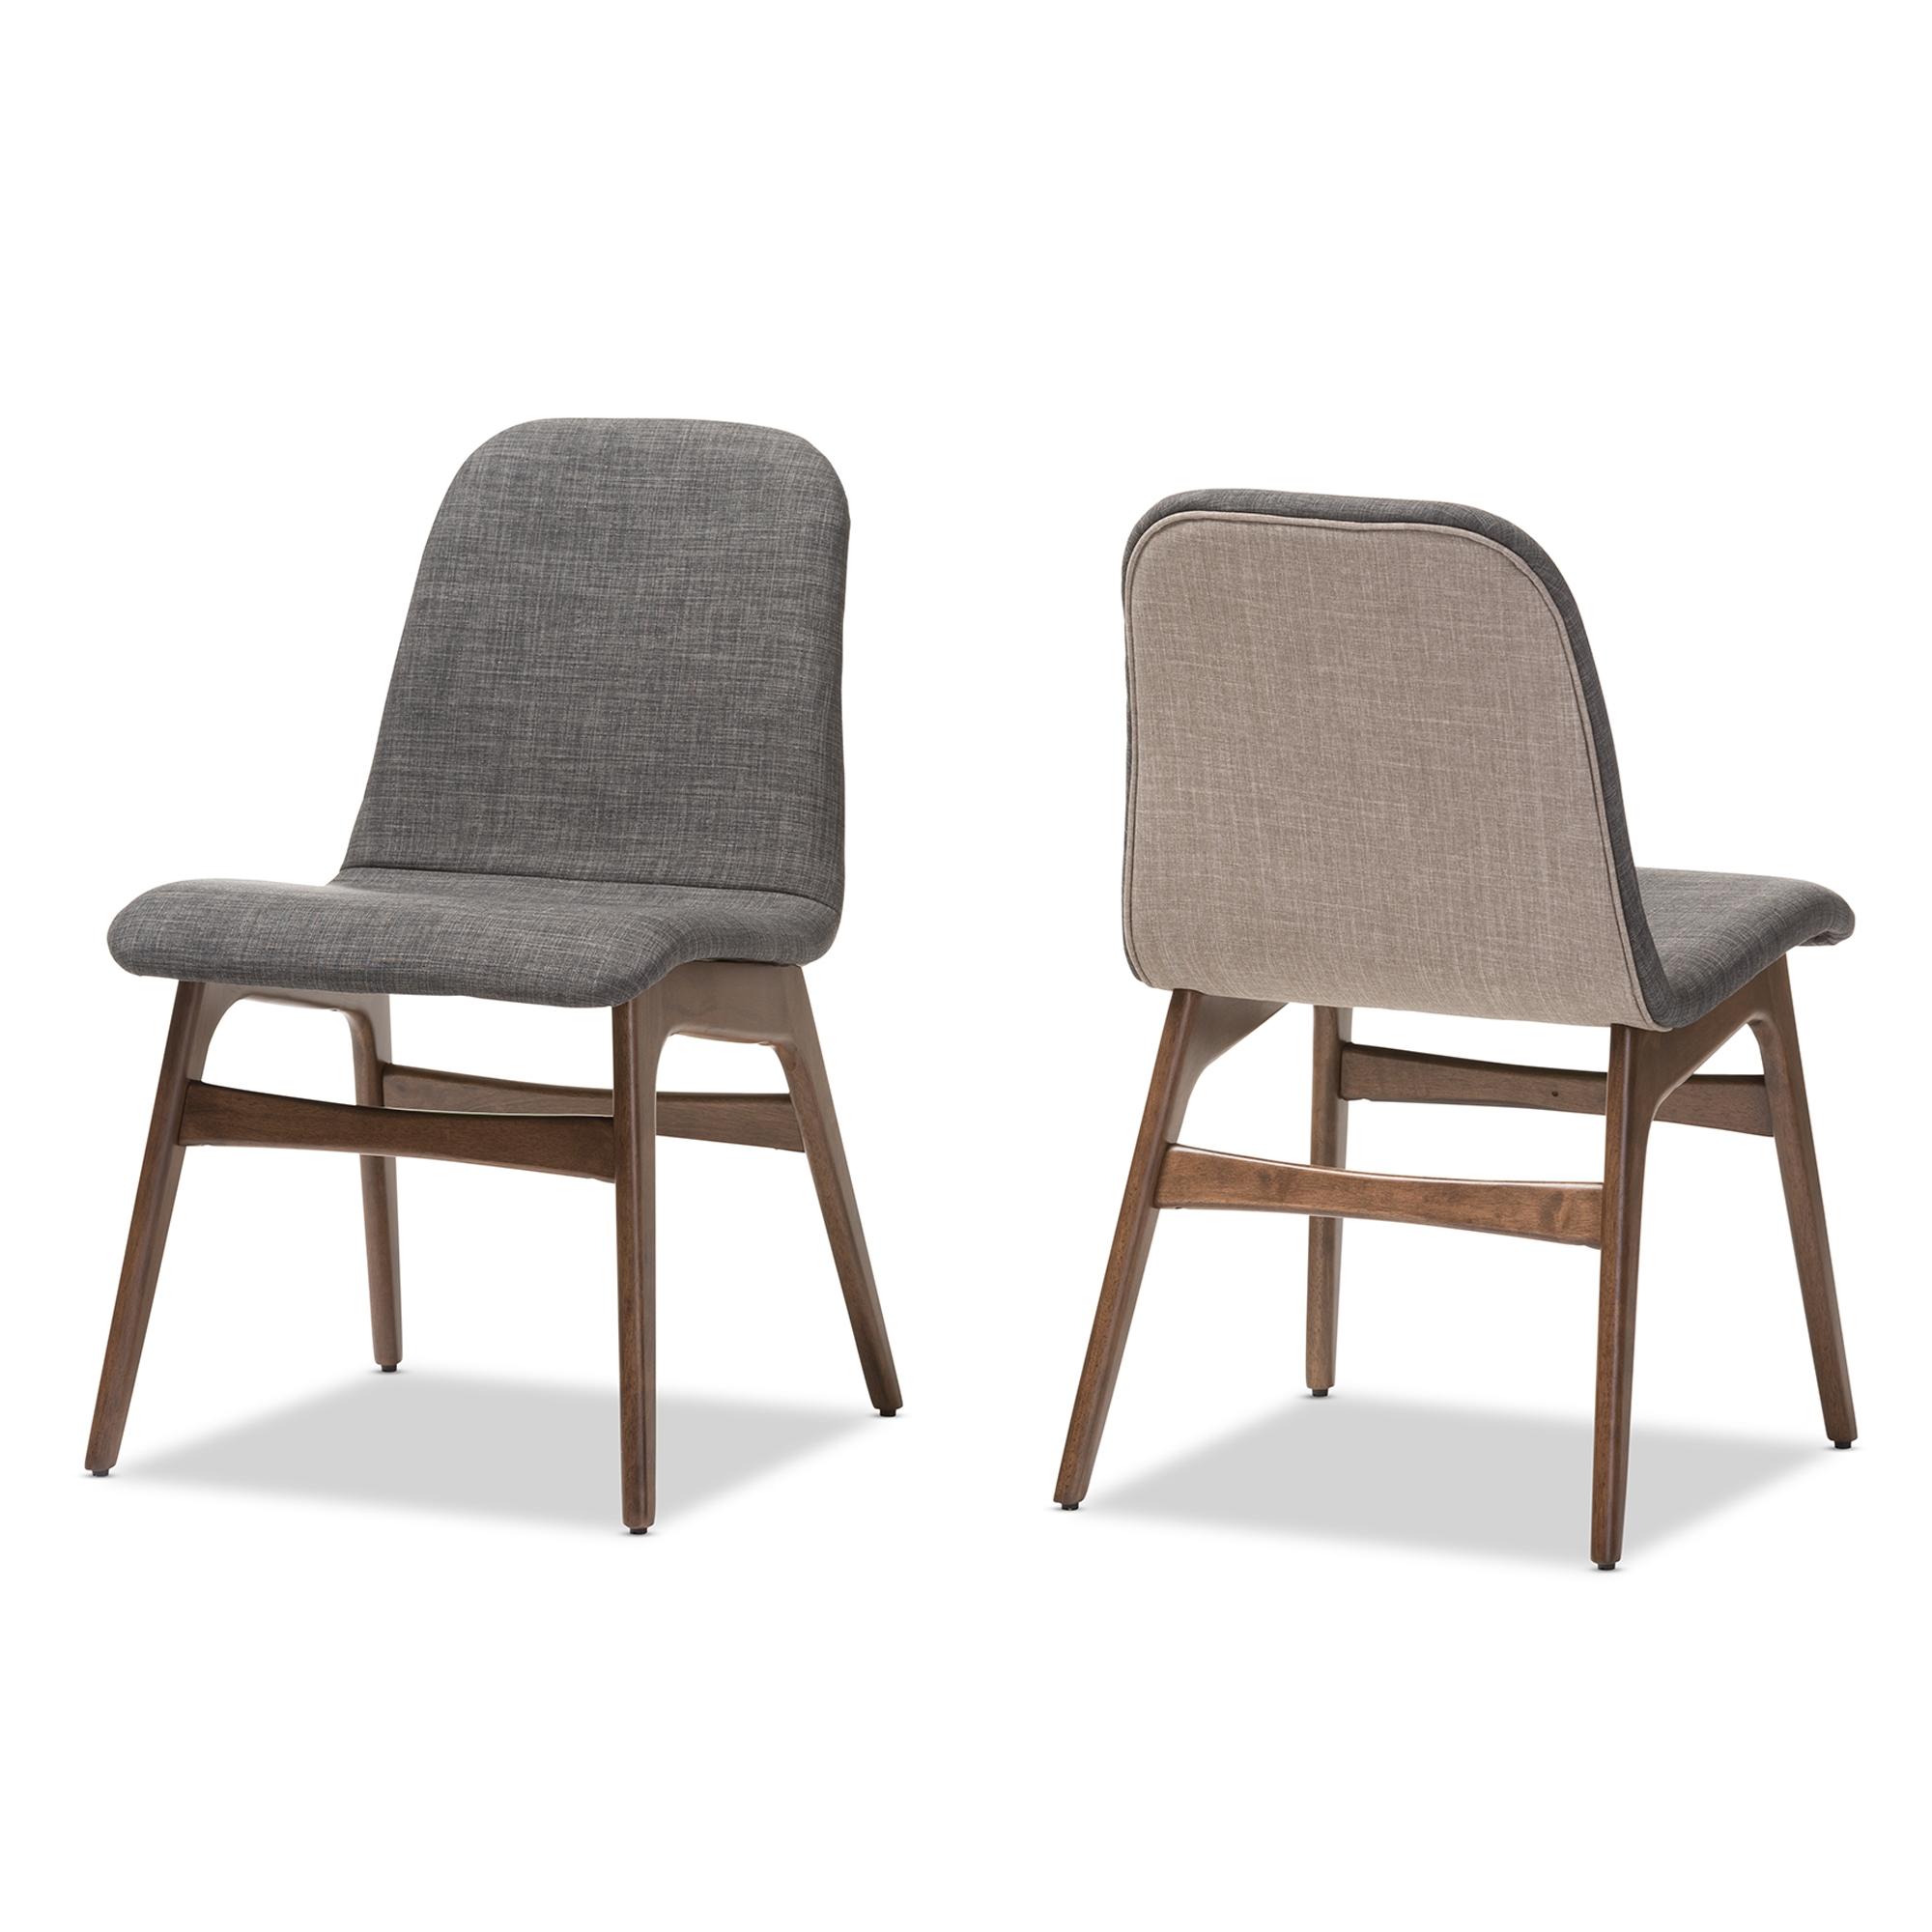 scandinavian retro furniture. Baxton Studio Embrace Mid-century Retro Modern Scandinavian Style Dark Grey Fabric Upholstered Walnut Wood Furniture